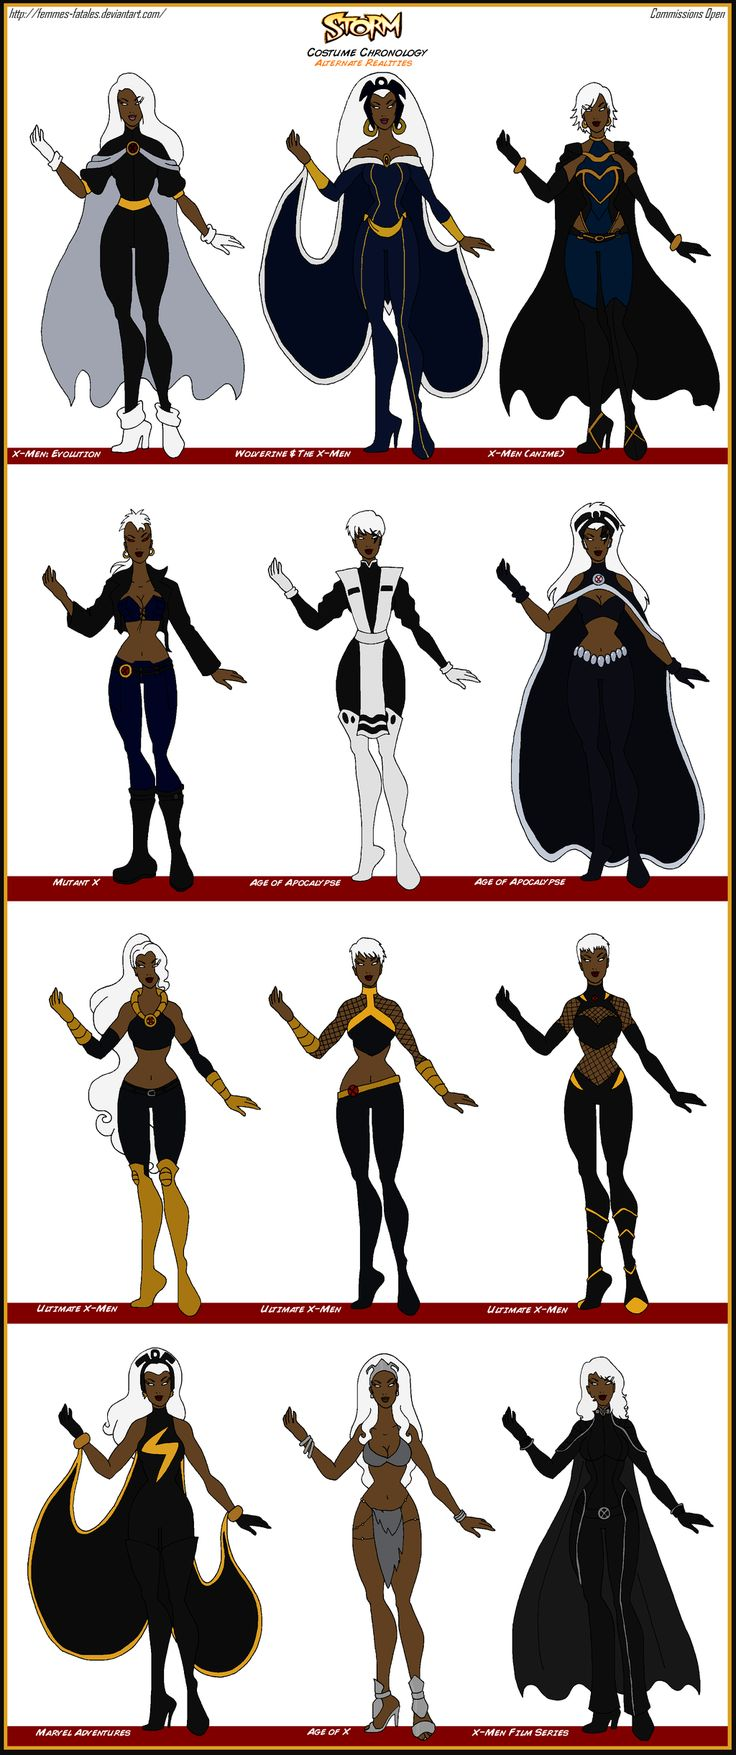 Storm - Alternate Realities Costume Chronology by Femmes-Fatales on DeviantArt